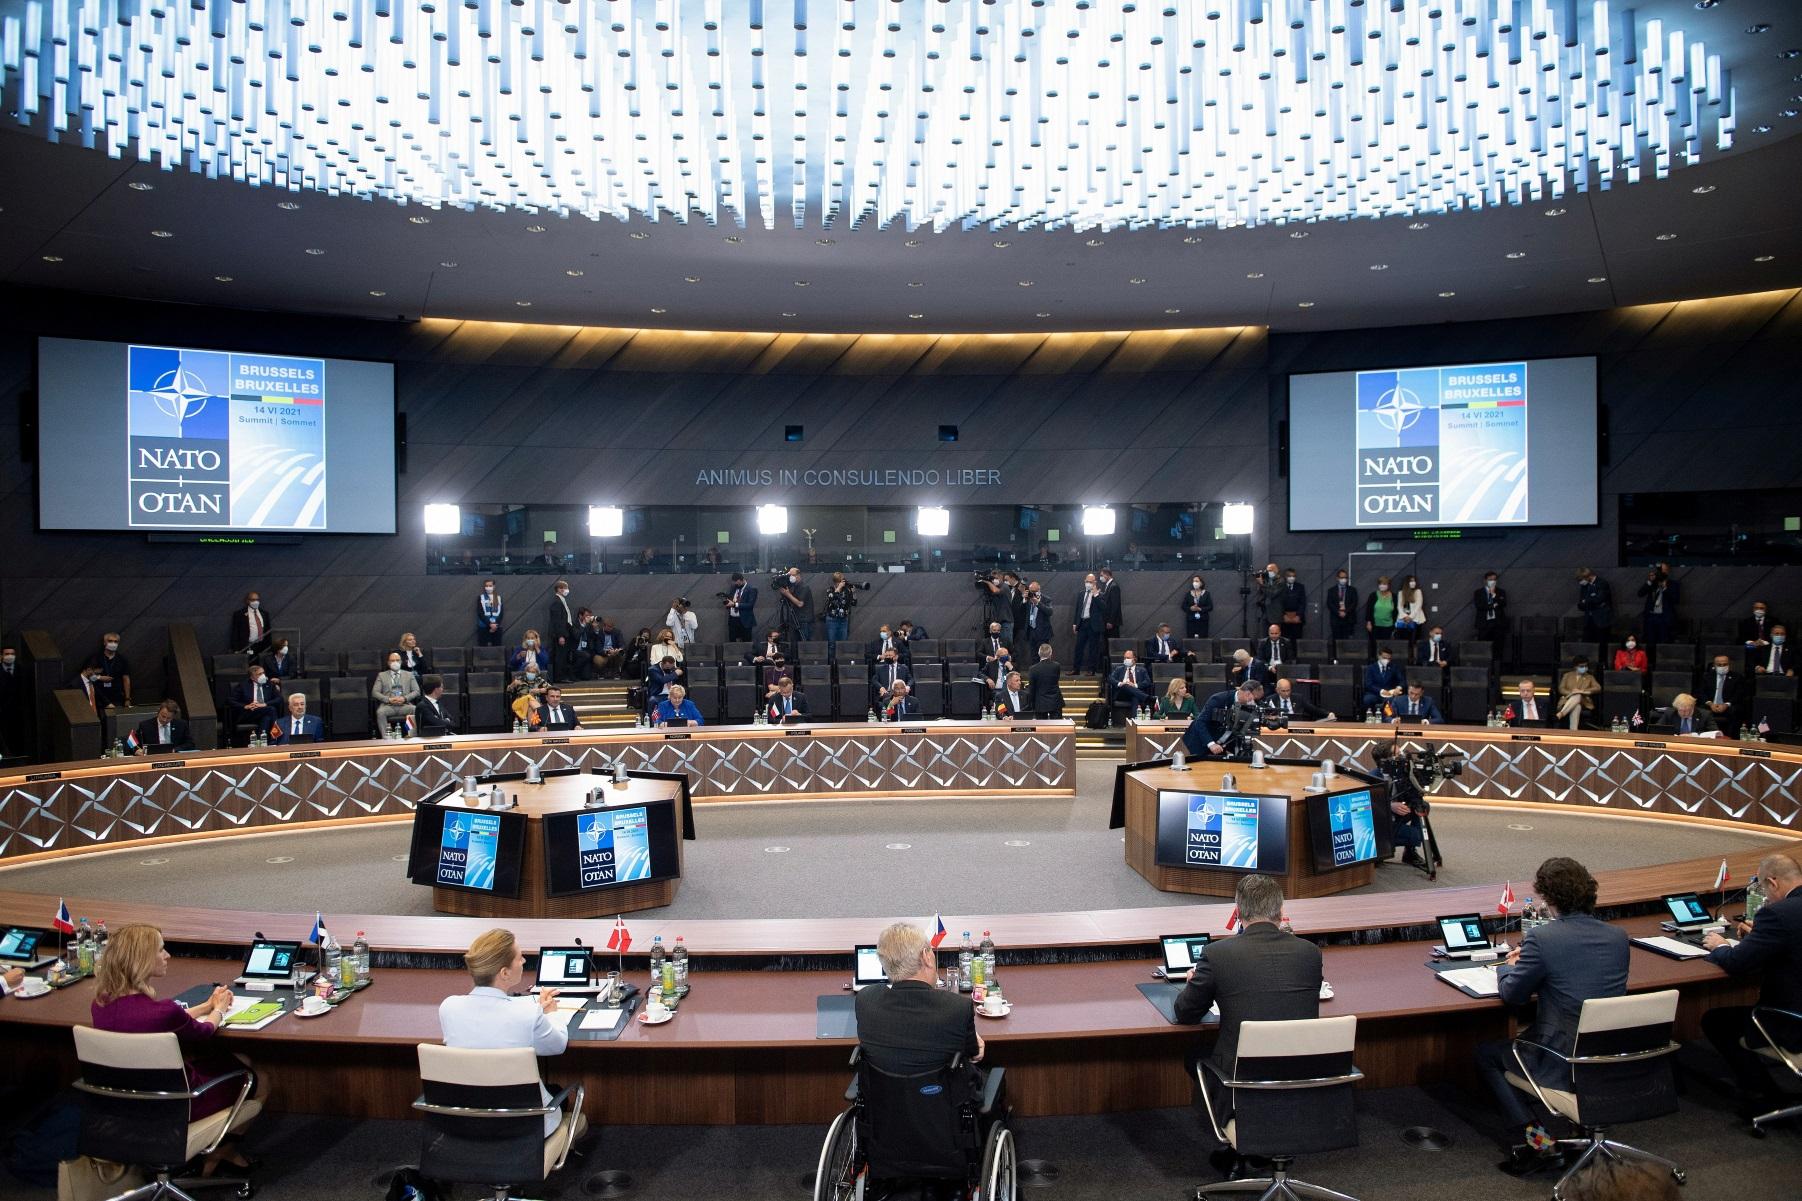 NATO: Χαρακτηρίζει την συμπεριφορά της Κίνας ως «συστημική πρόκληση»